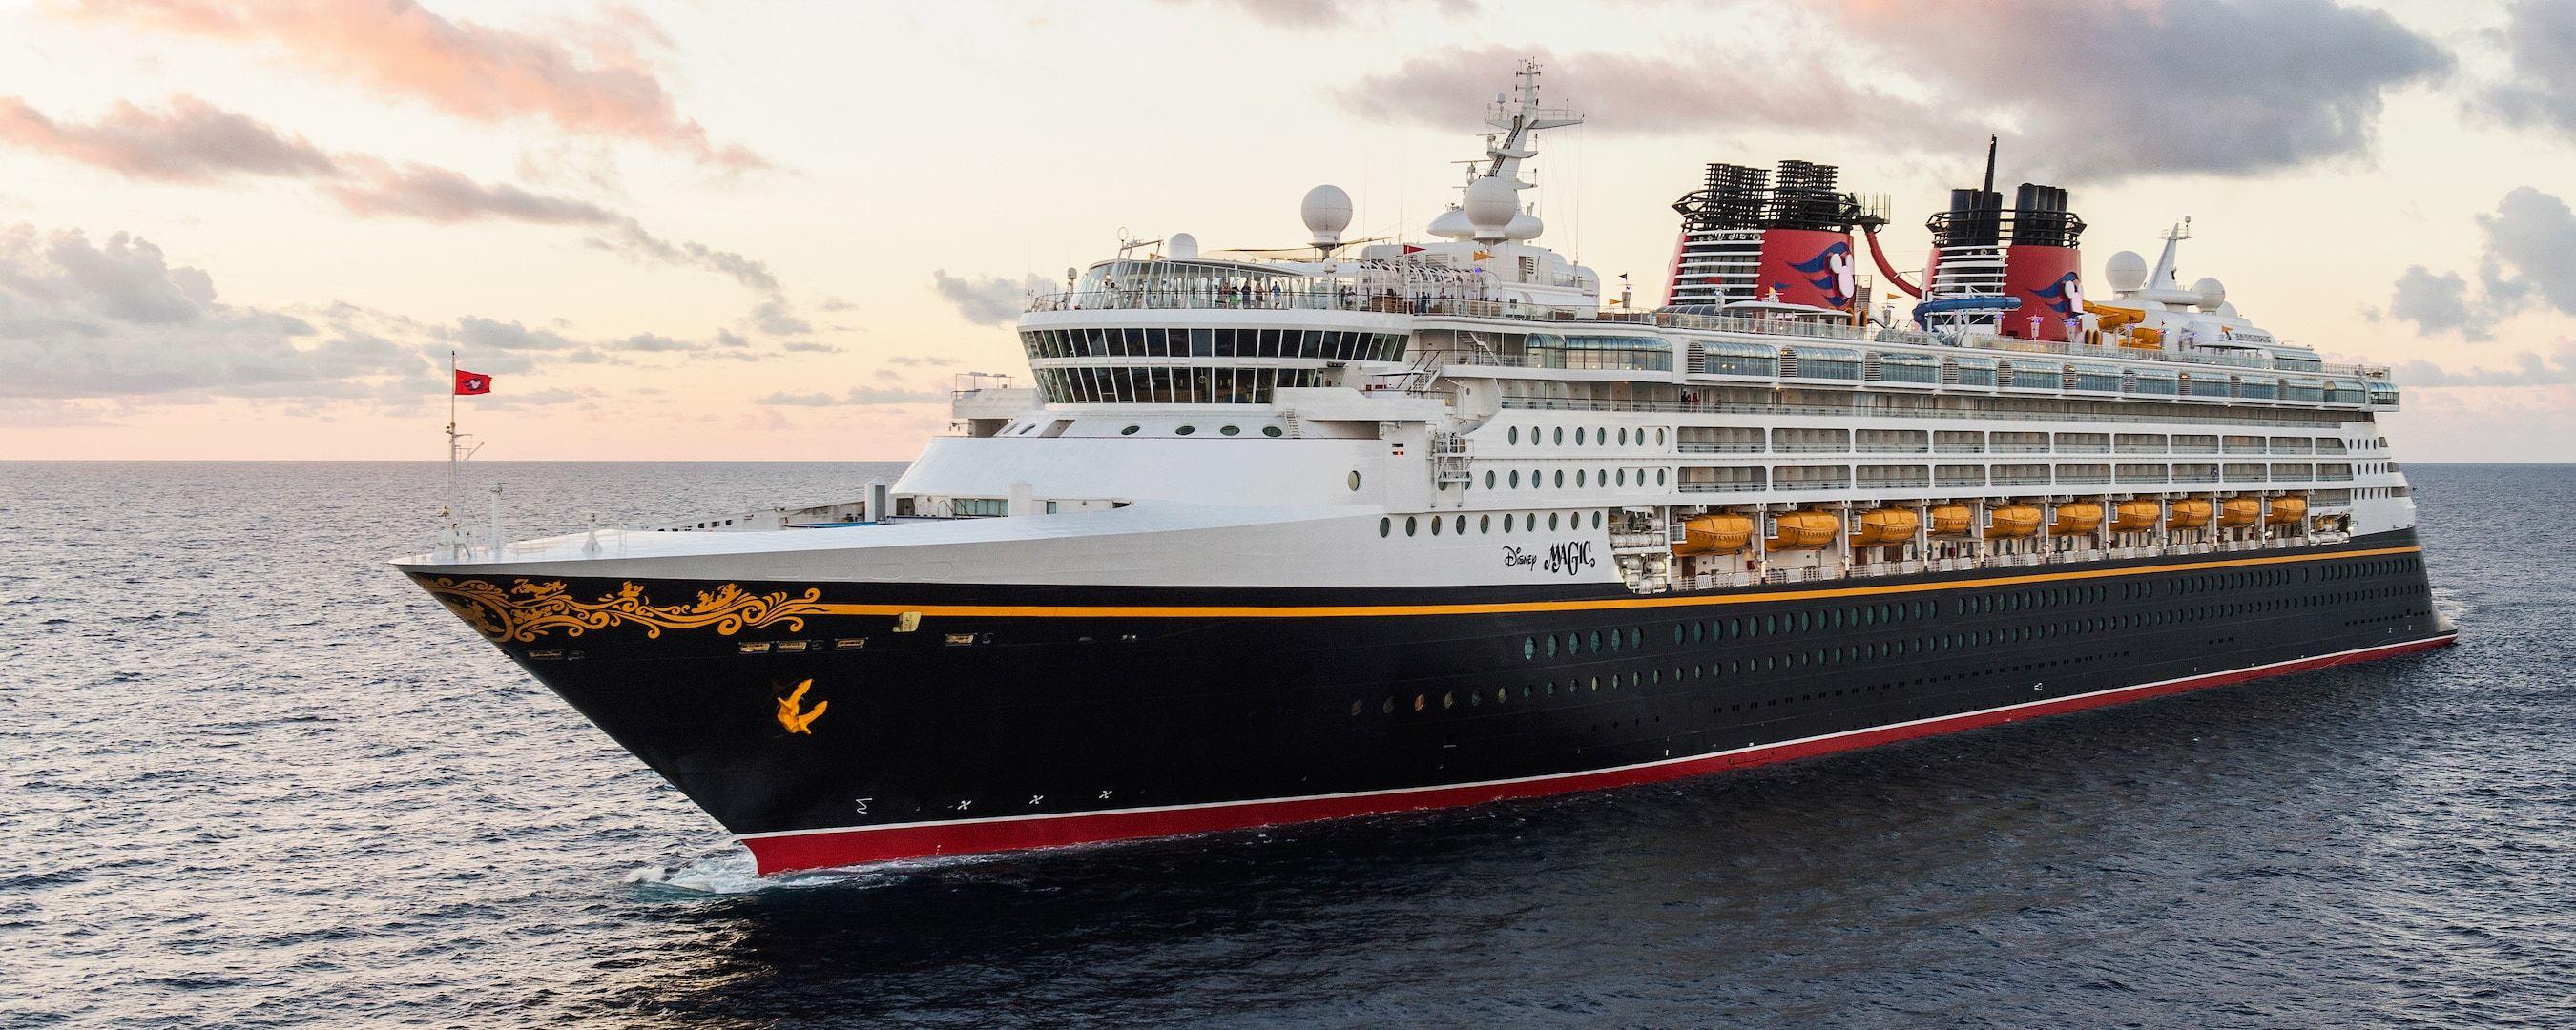 The Disney Magic ocean liner sailing the open seas